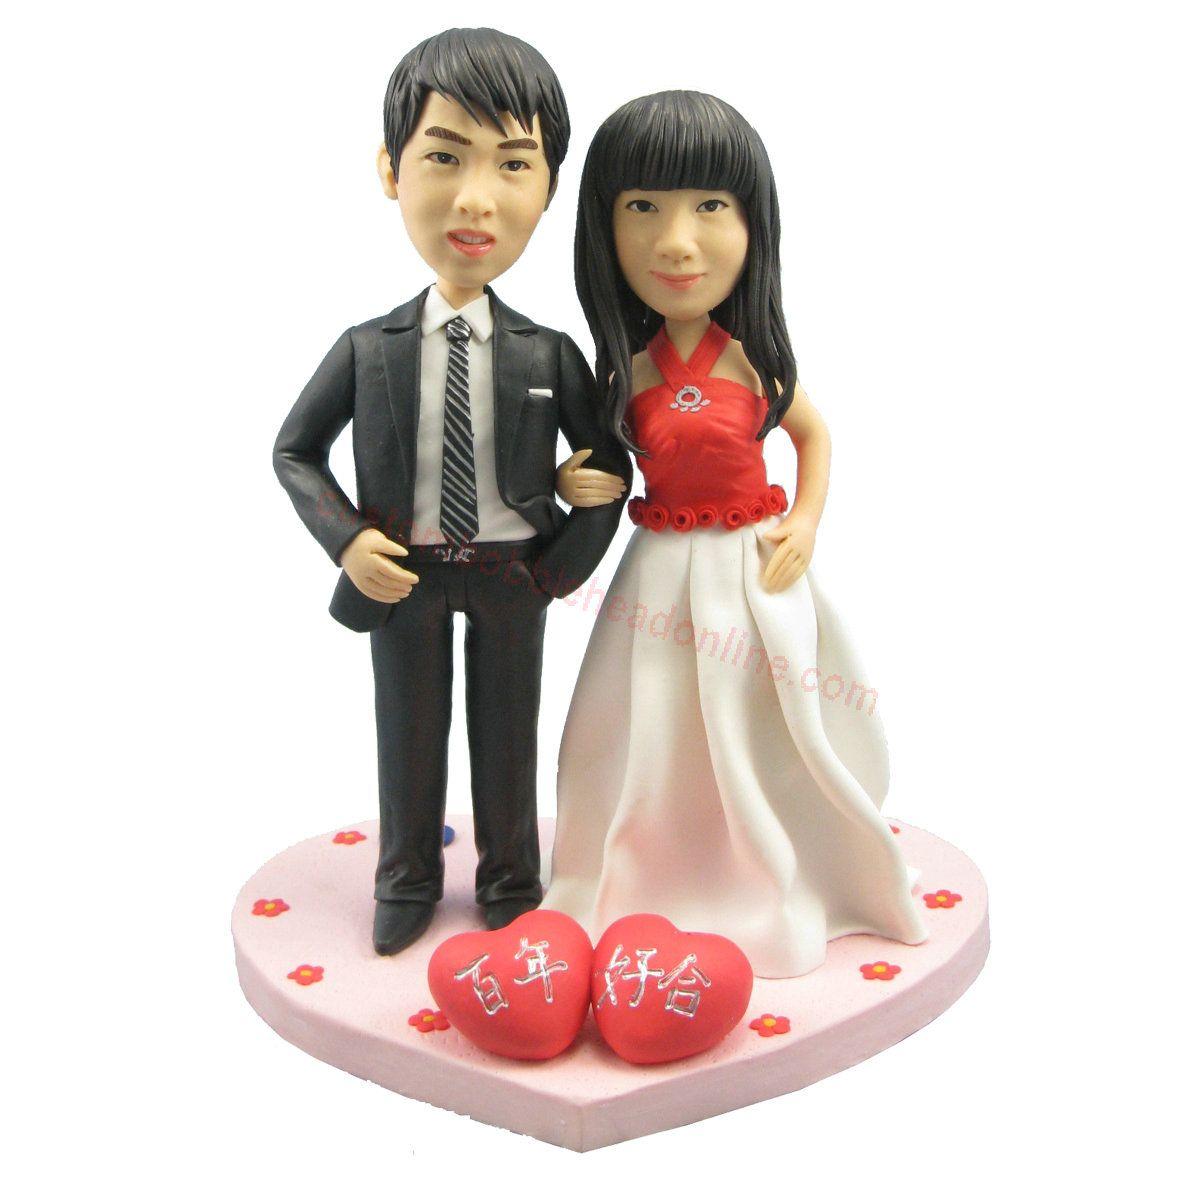 shop custom wedding bobbleheads - make your own bobble head ...